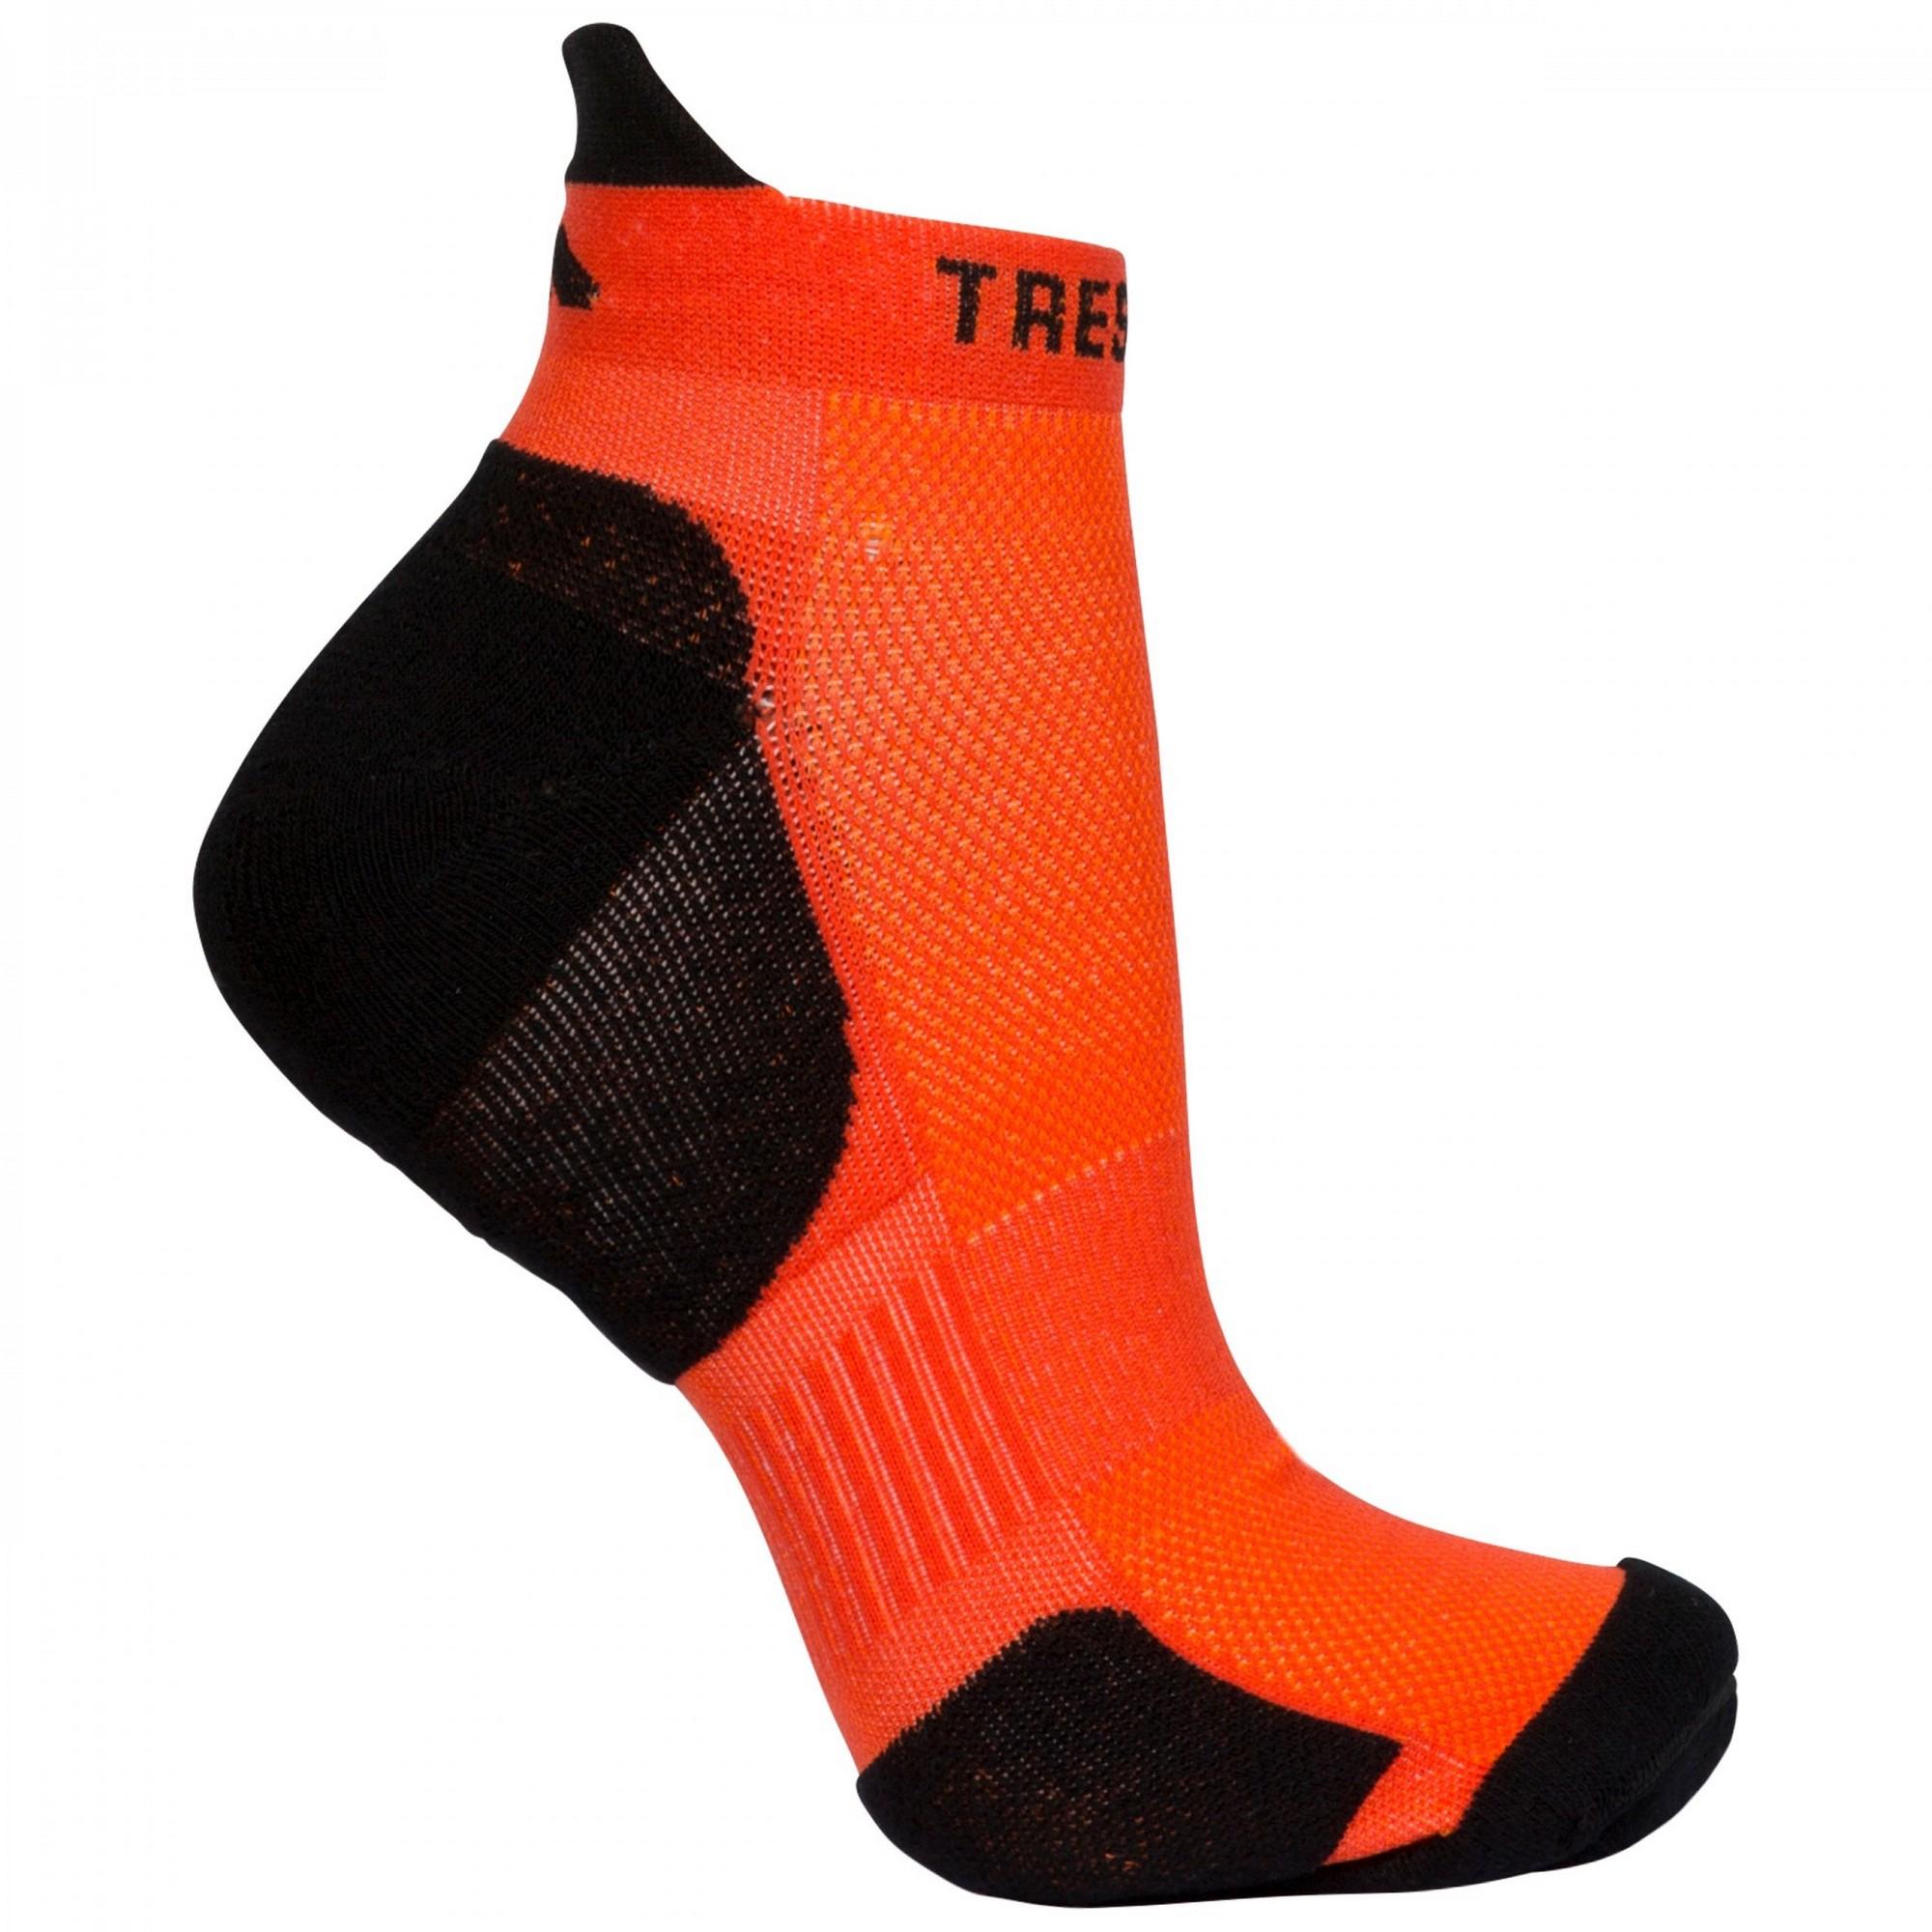 3 Pairs Trespass Mens Lapse Trainer Socks